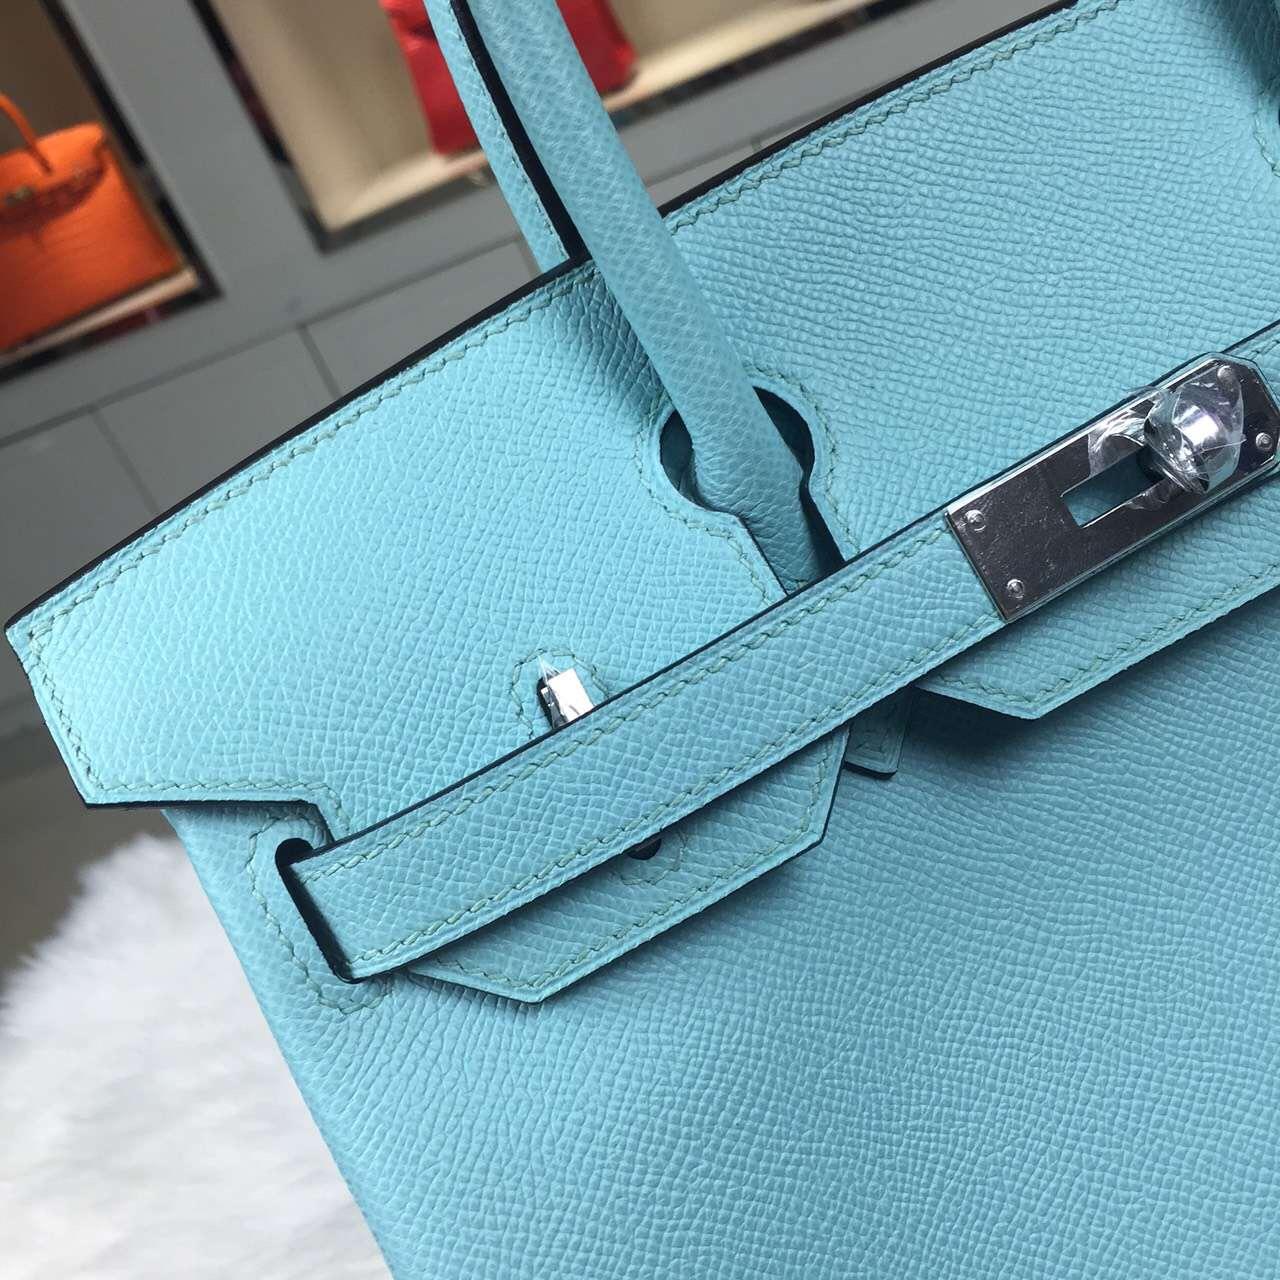 Wholesale Hermes Original Epsom Leather Birkin Bag 30CM in 3P Lagon Blue